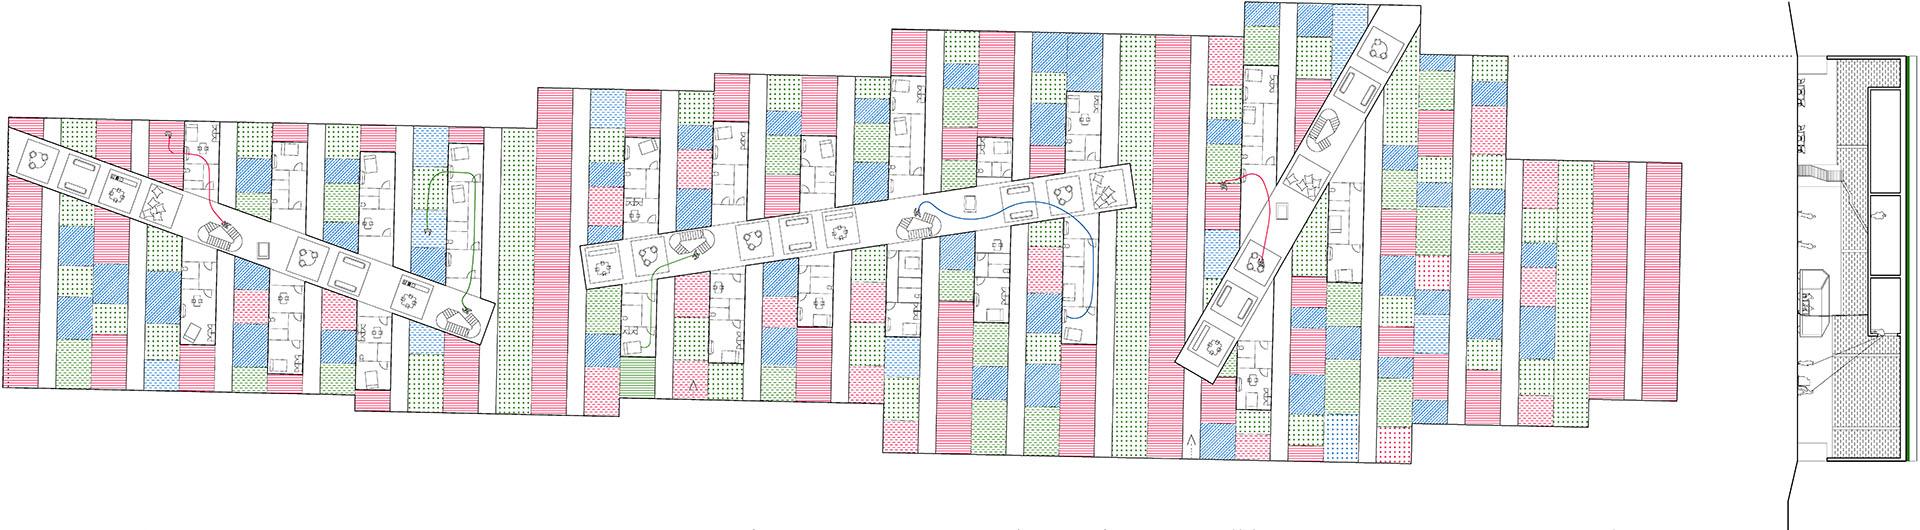 04 PLAYstudio Kune Europan 13 Bruck - Plan